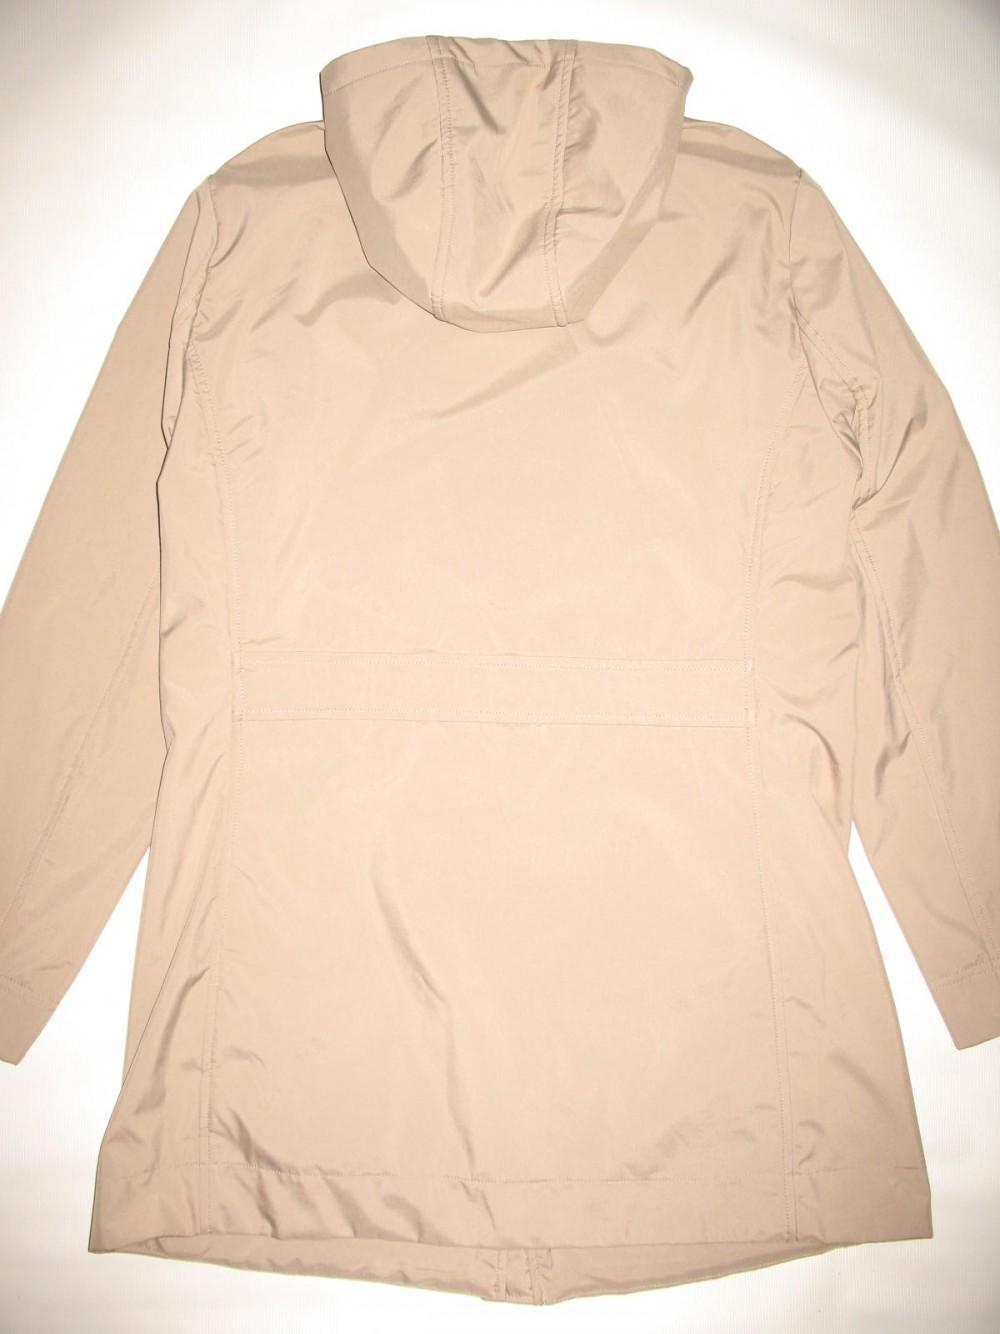 Куртка VAUDE softshell coat lady (размер 42/L-XL) - 1